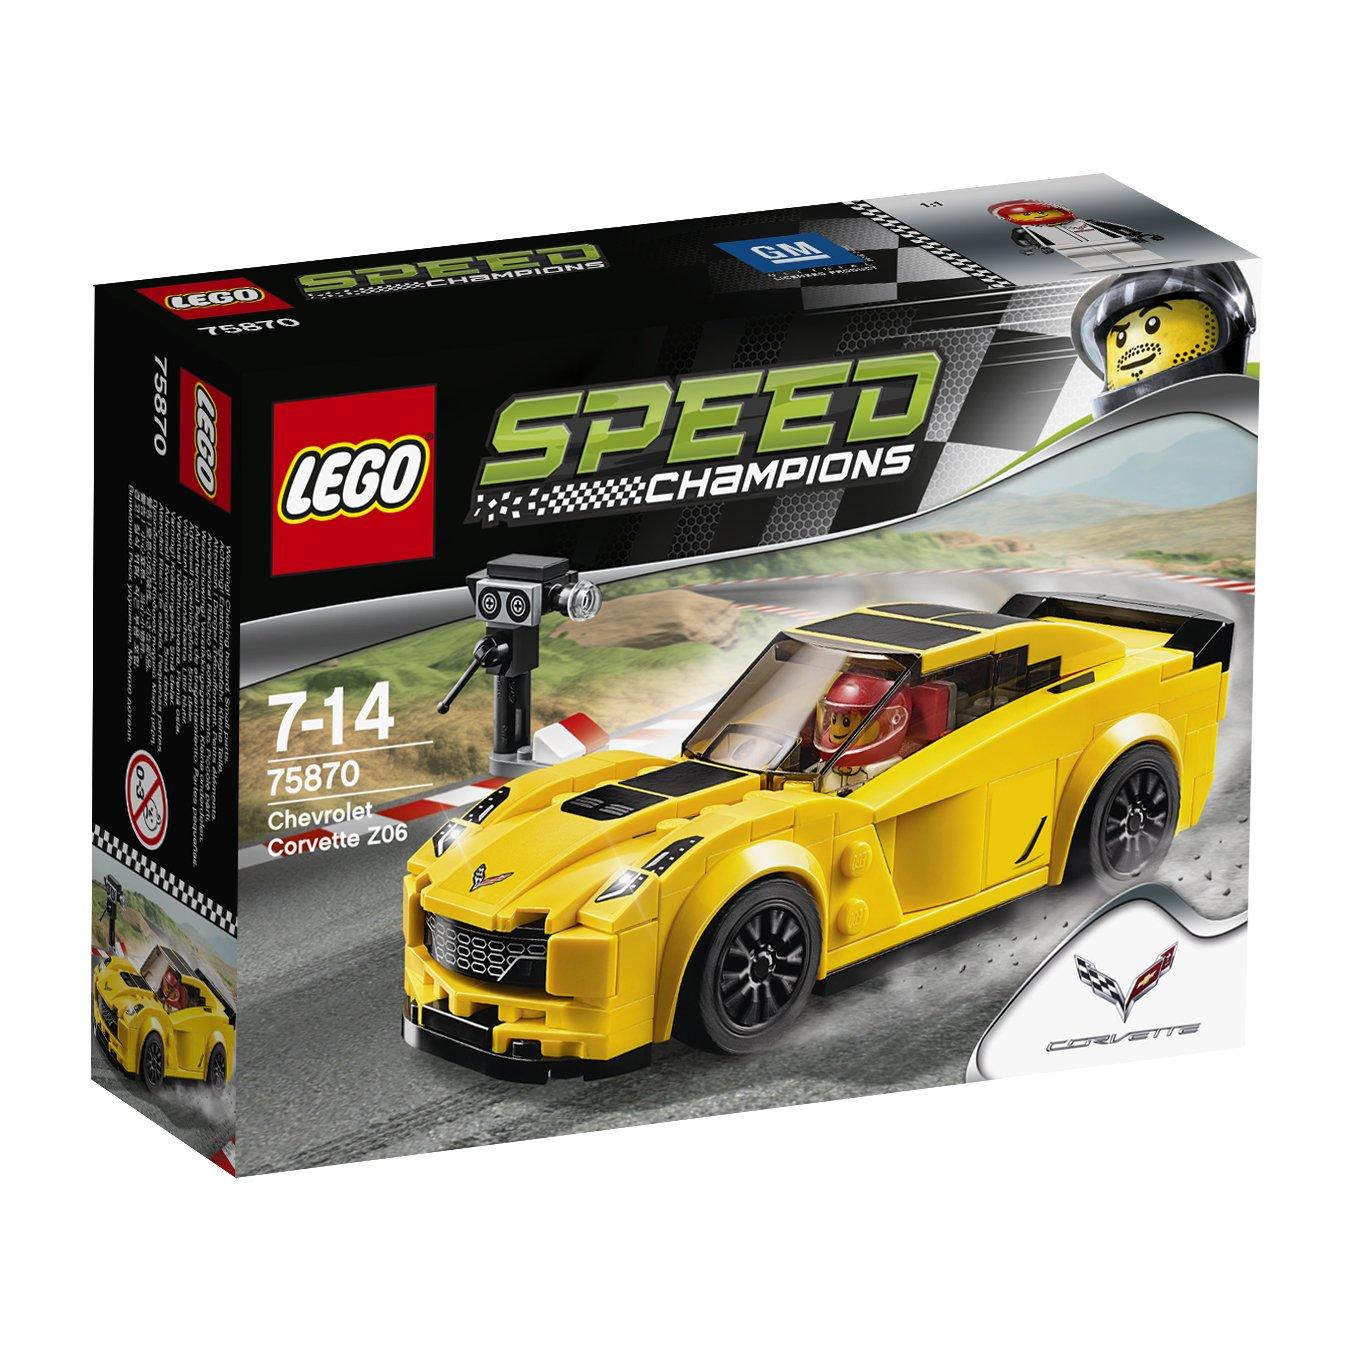 75870 Corvette Champions Chevrolet Lego Speed Z06 0kXwOnPZN8